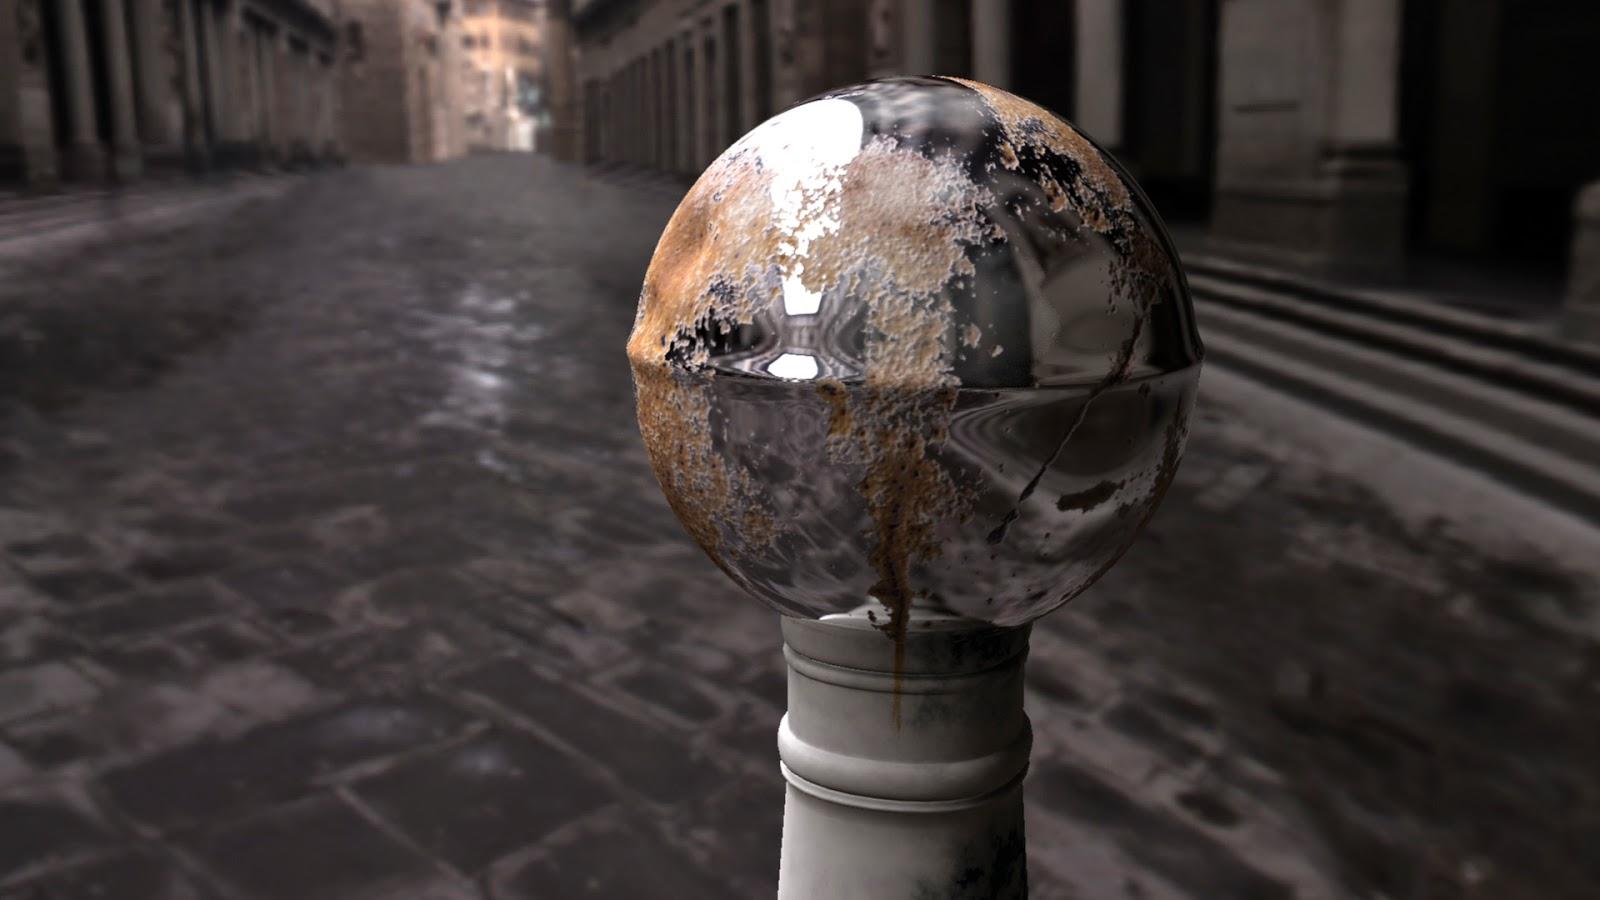 cunningham_dirty_mirror_ball_redux